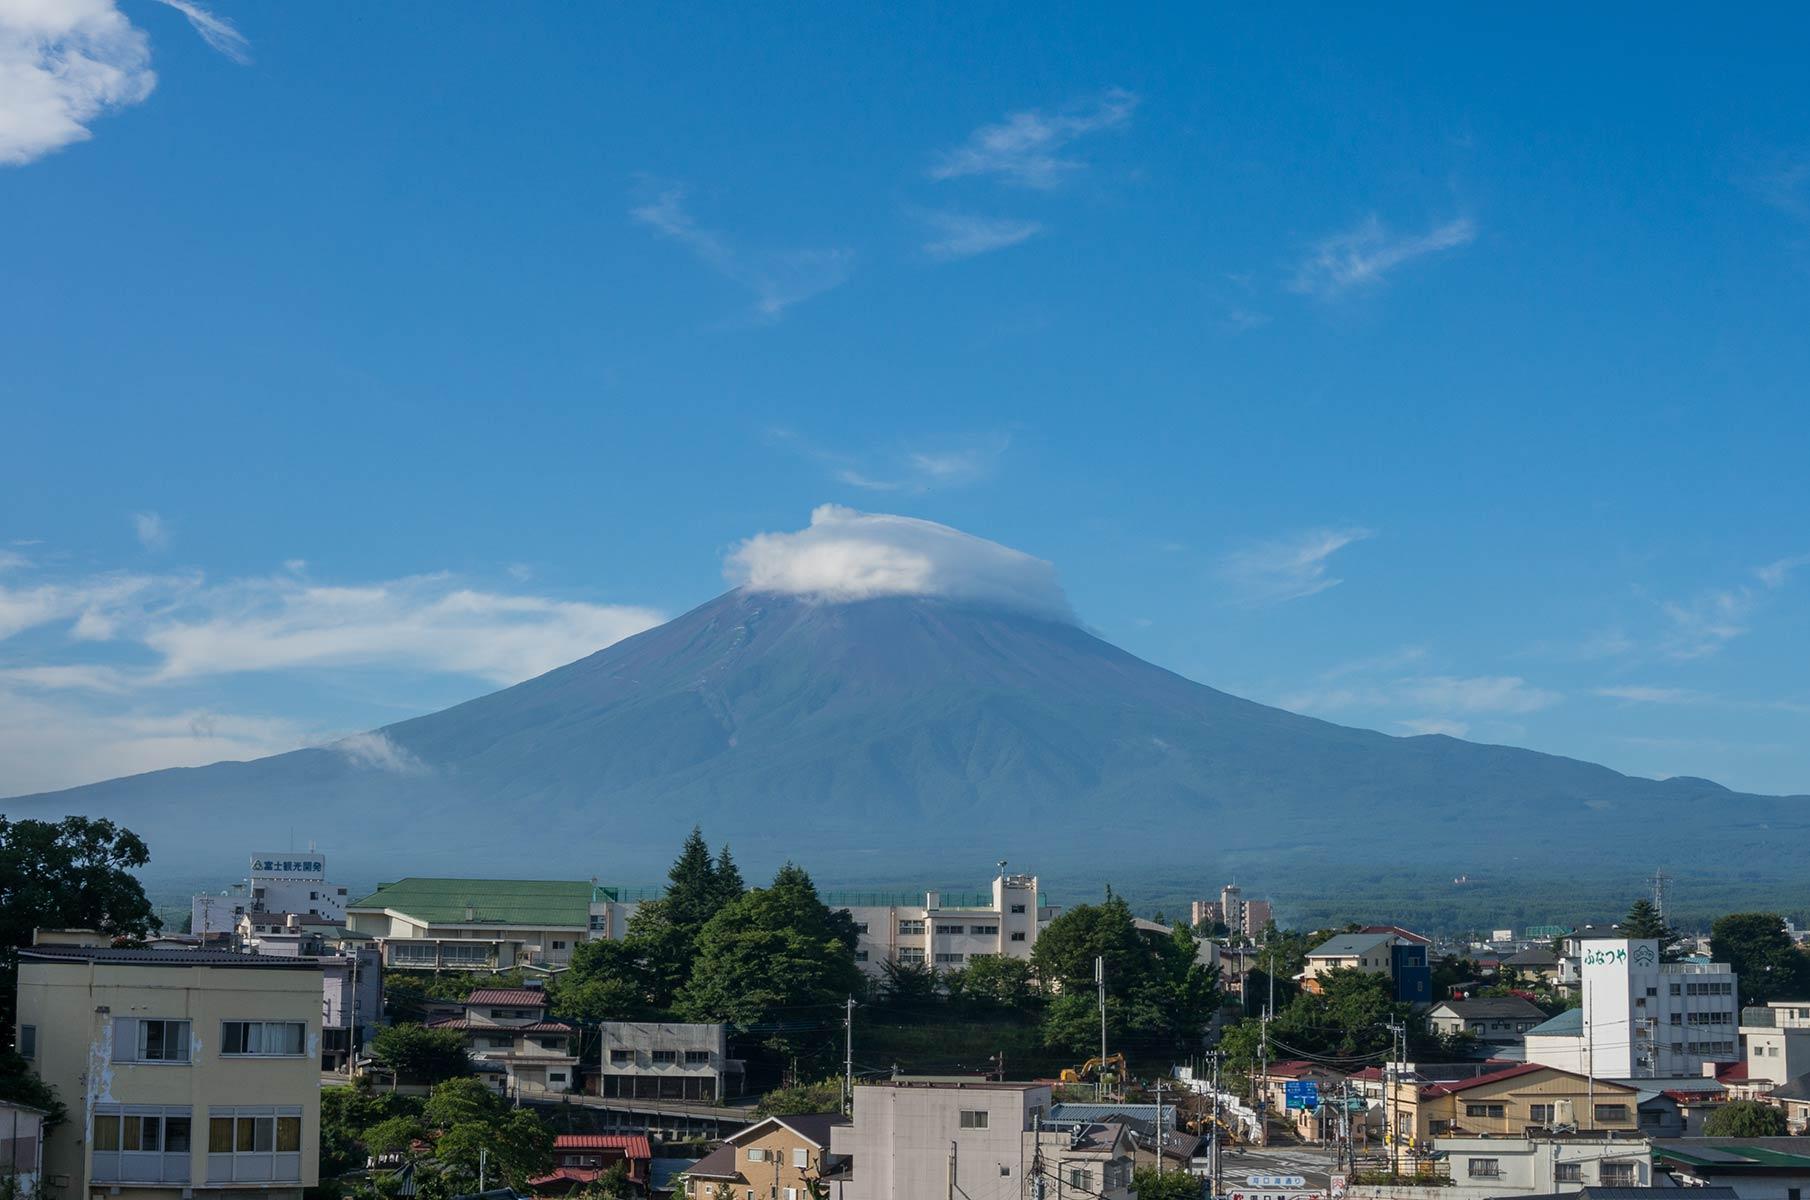 Blick vom Konanso Yamanashi Hotel in Kawaguchiko auf Mt. Fuji in Japan